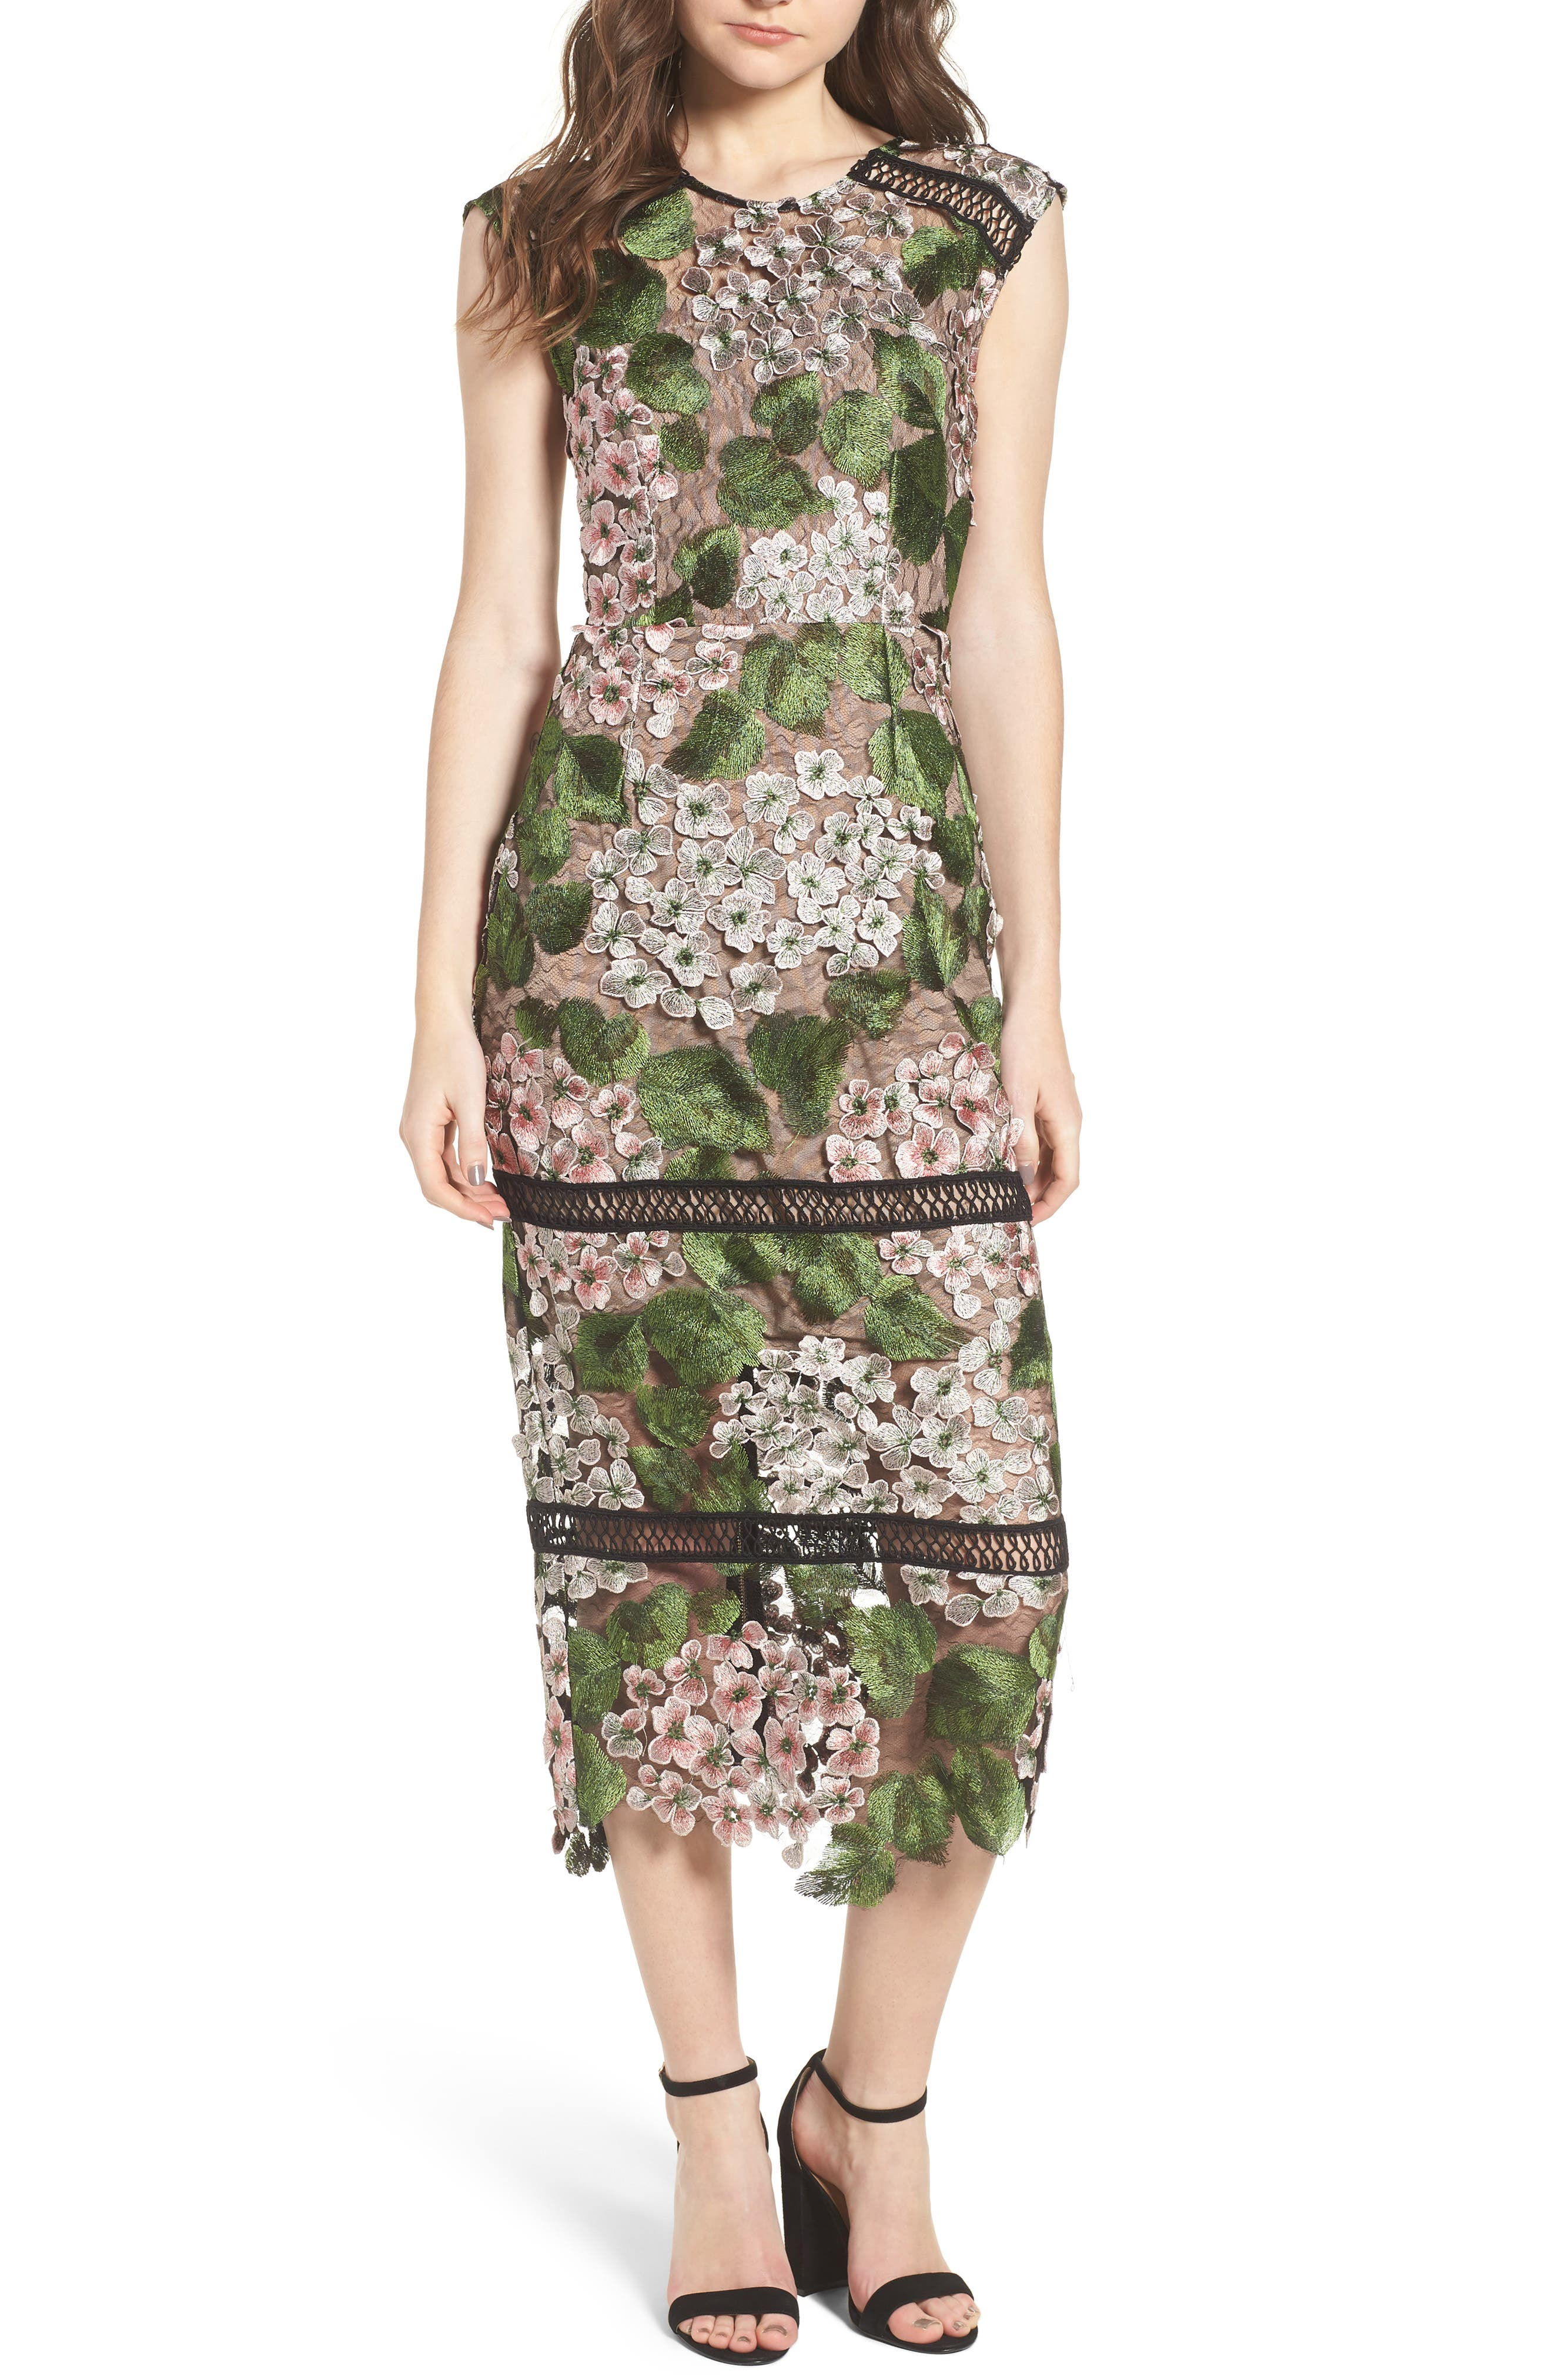 Cherry Hydrangea Lace Dress,                             Main thumbnail 1, color,                             Multicolor Pink